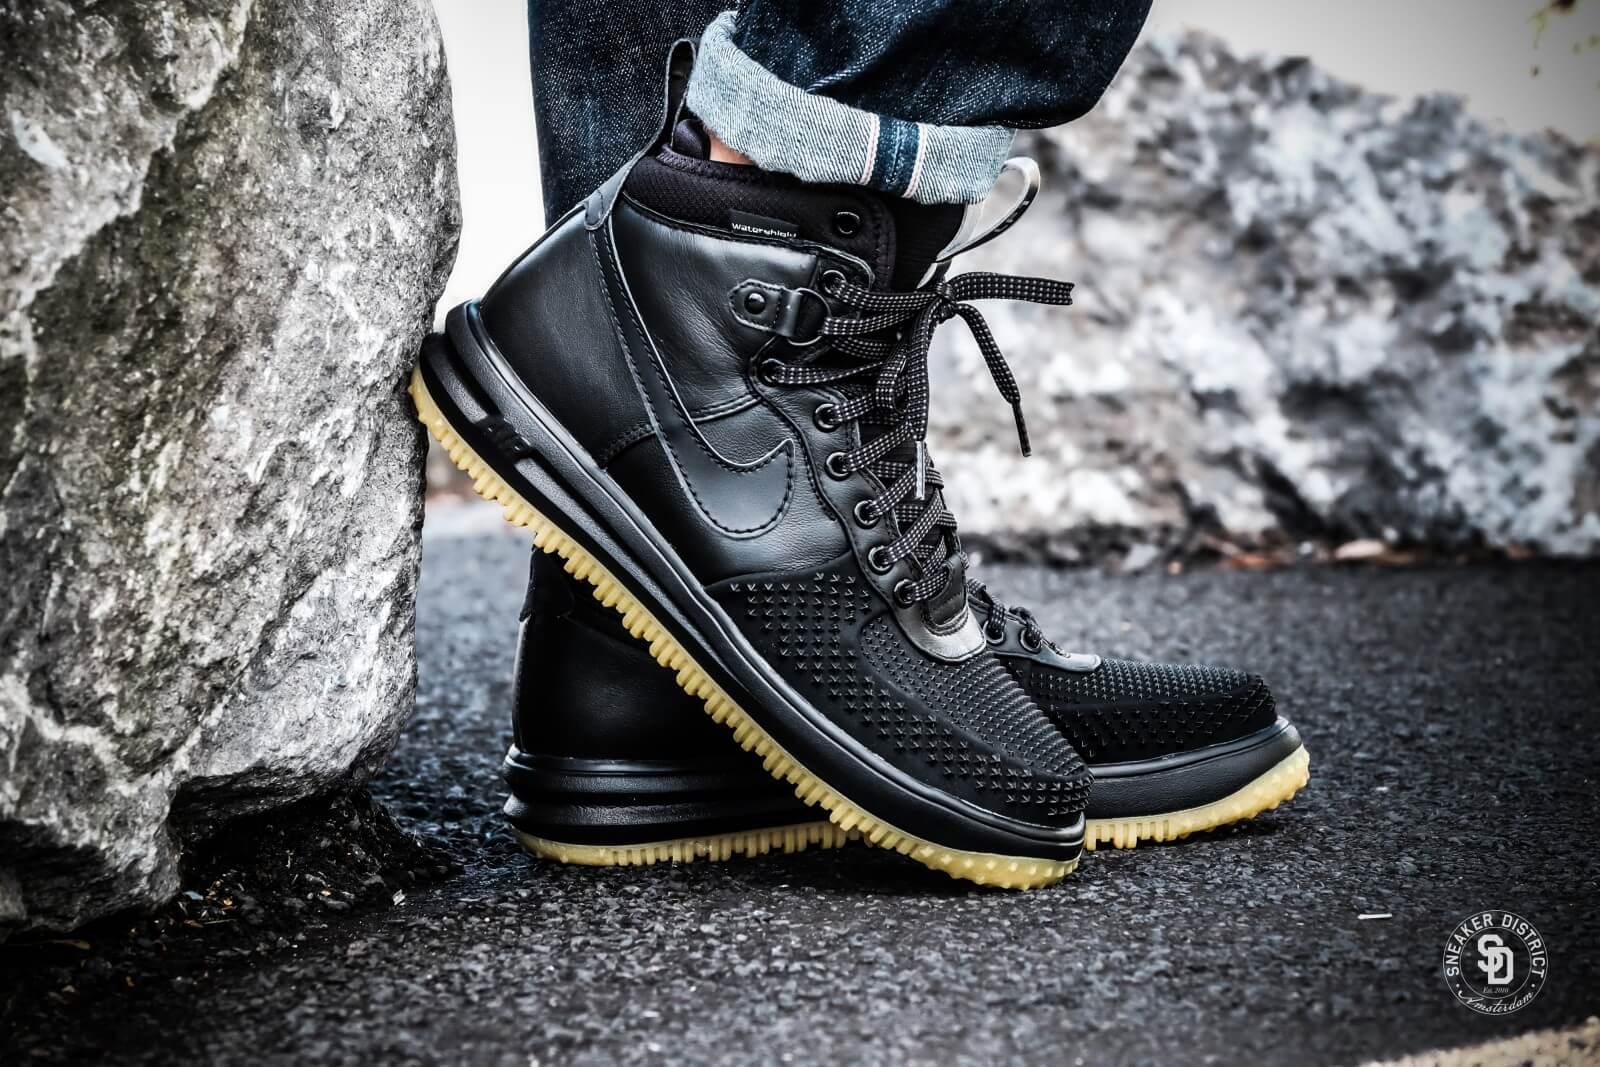 Nike Lunar Force 1 Duckboot Black Black Metallic Silver